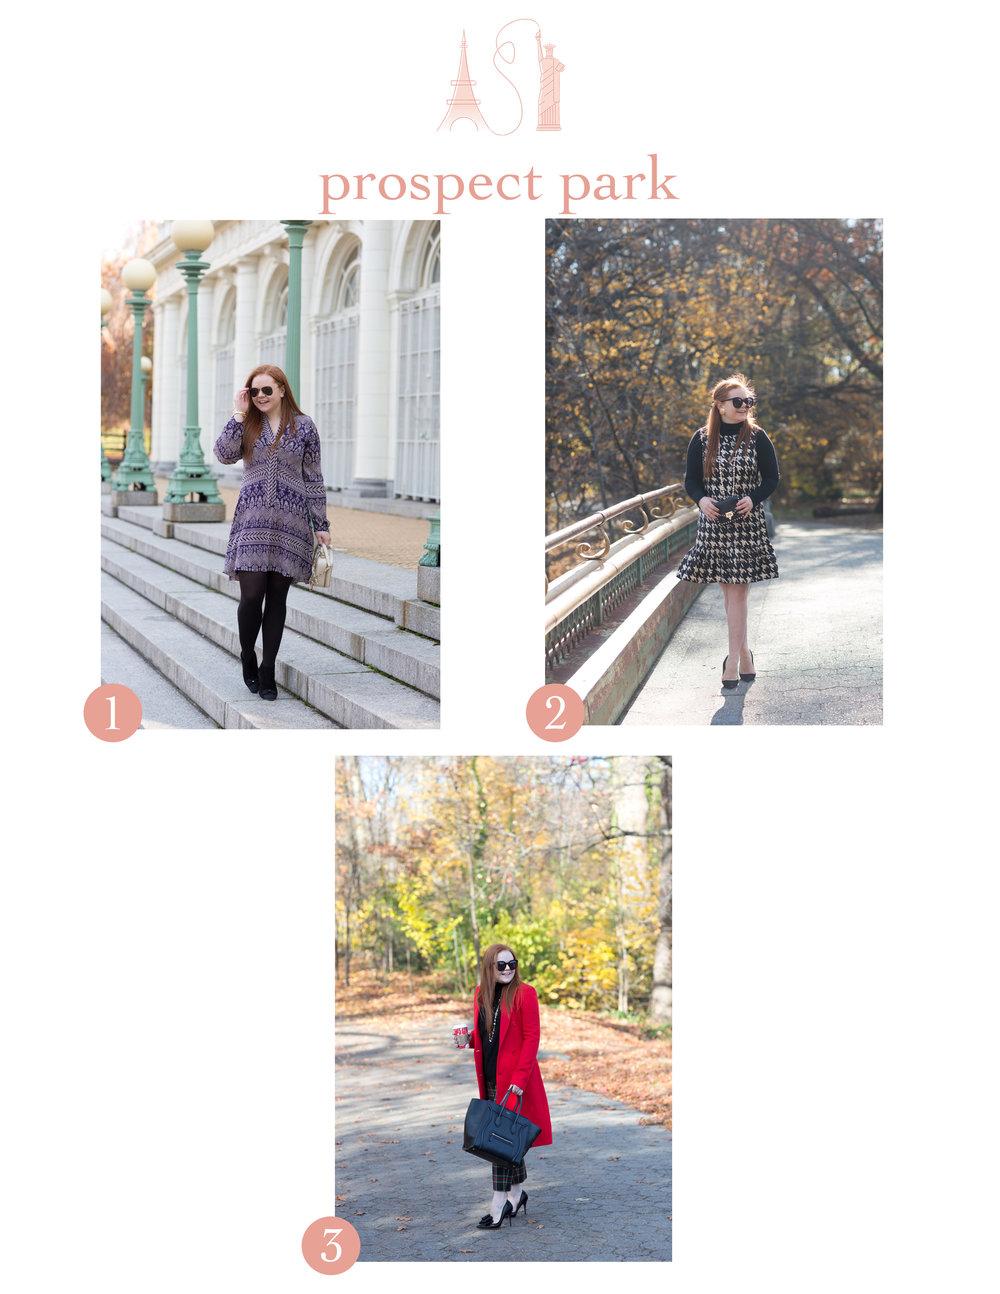 prospect_park_photo_locations.jpg